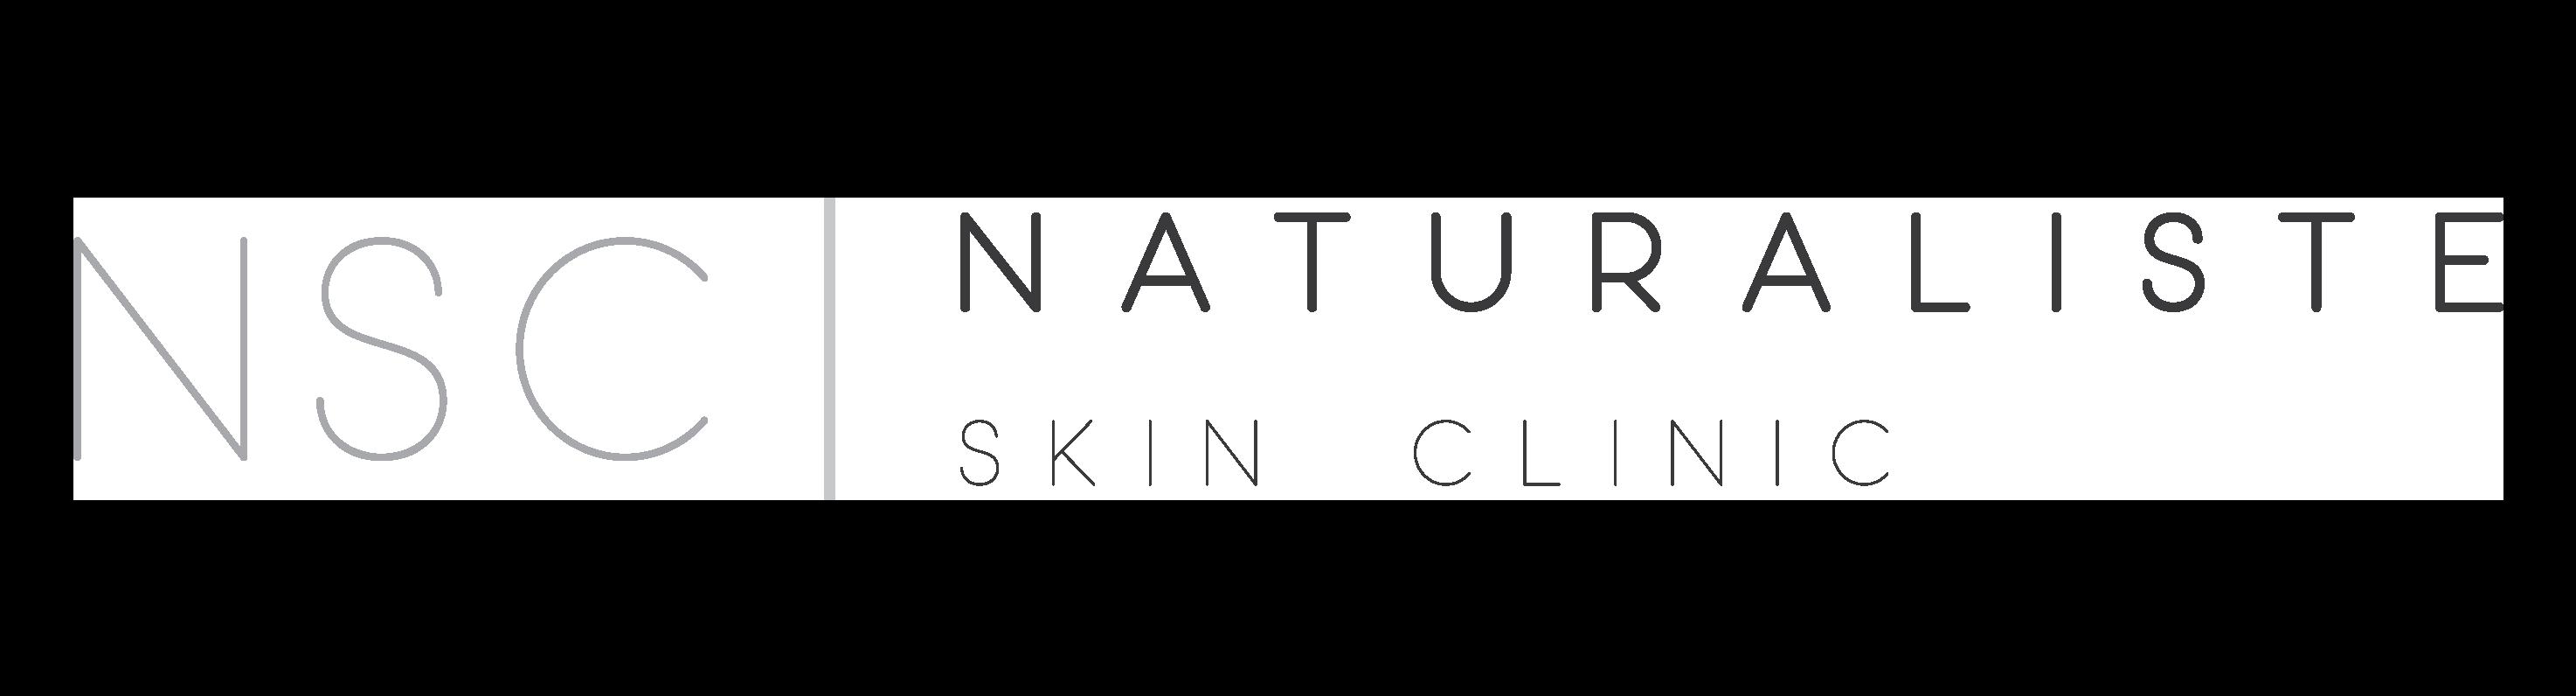 Naturaliste Skin Clinic